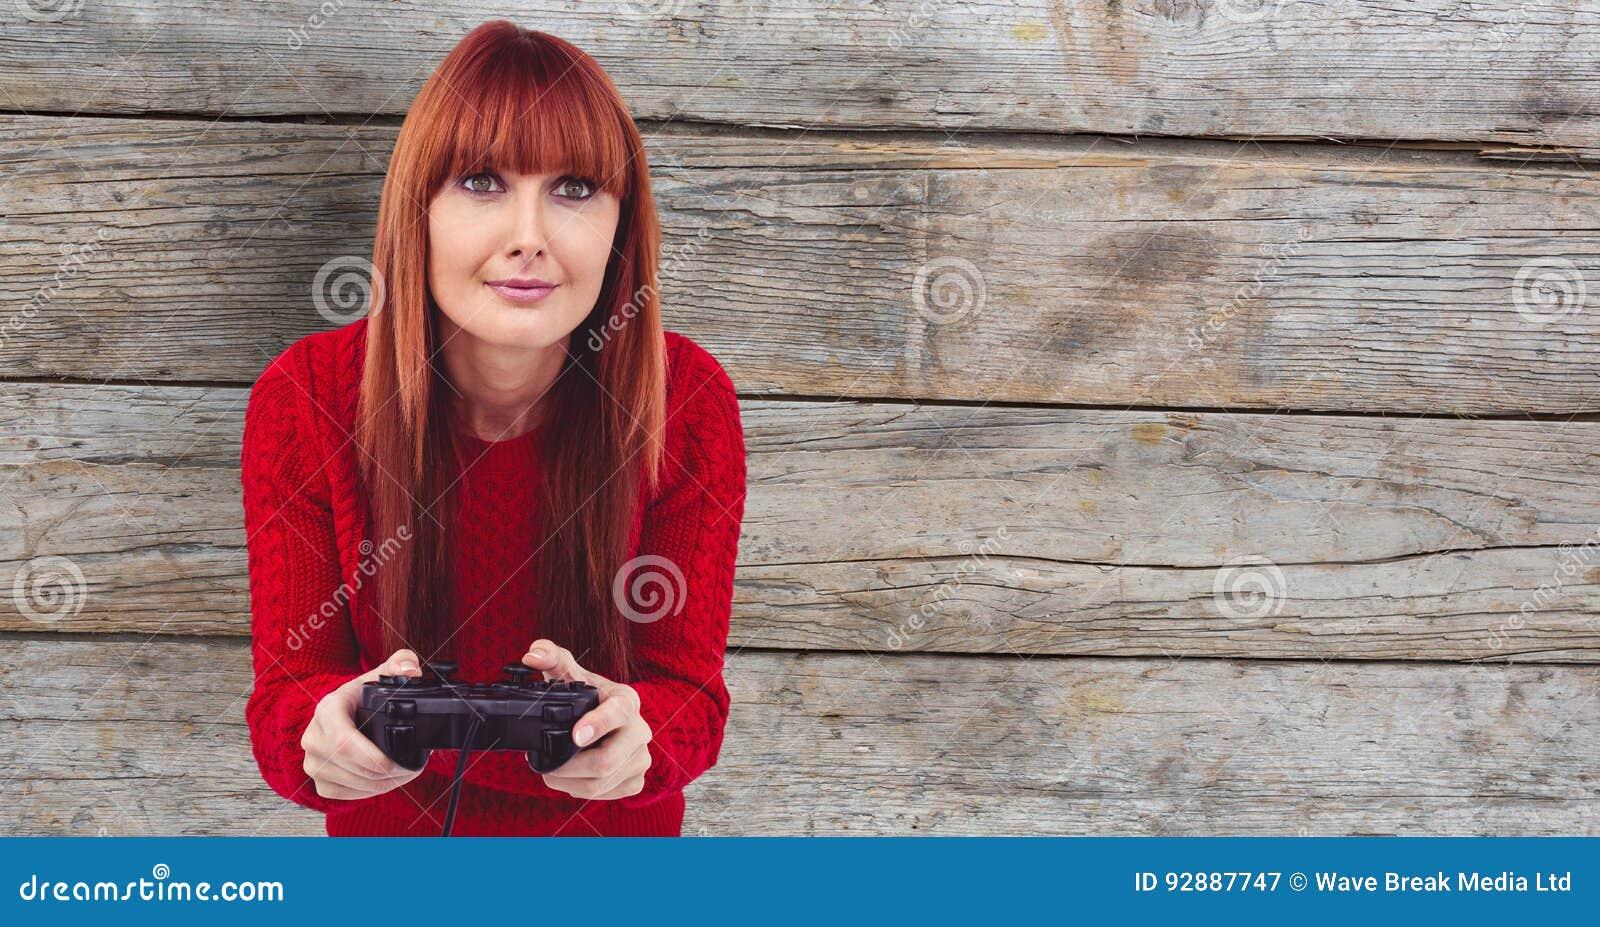 Digital redhead photos